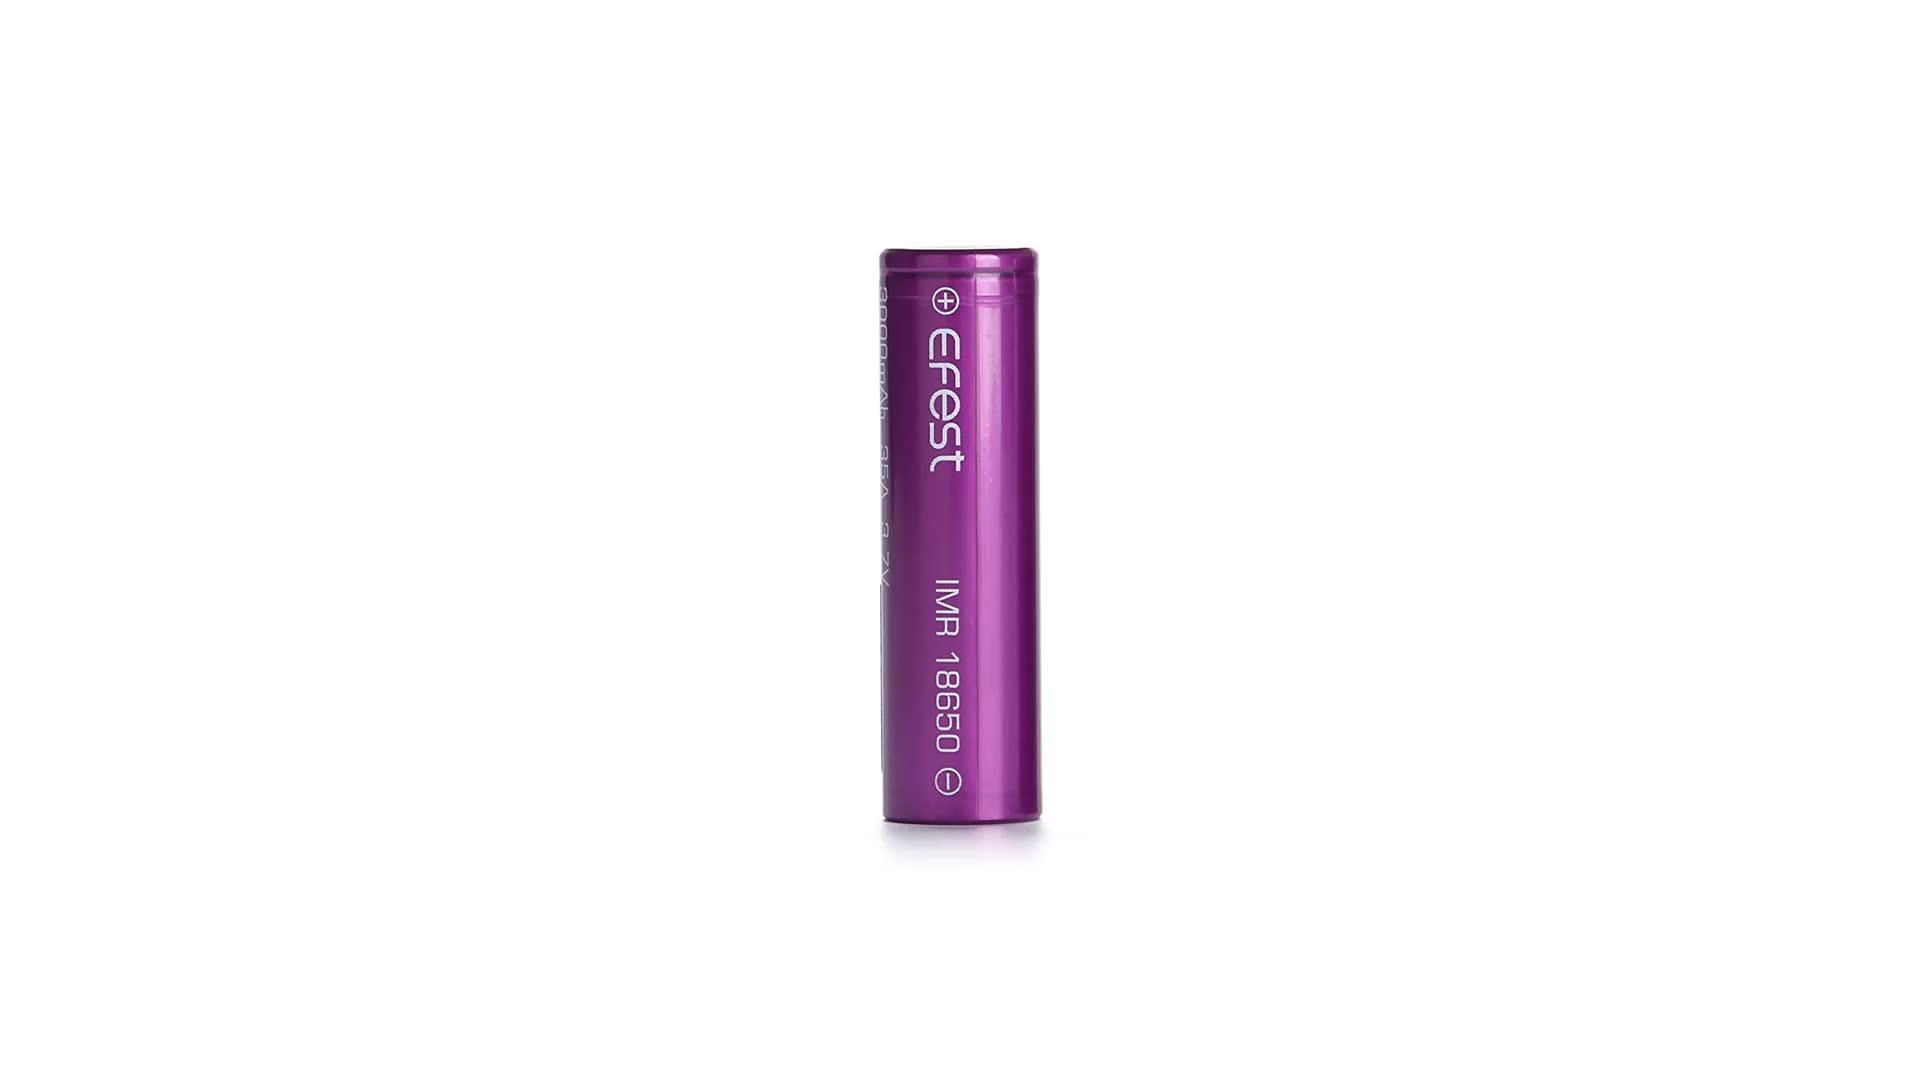 Original lifepo4 26650 rechargeable battery 3.2v 3000mah 3Ah SE US26650FT Japan made